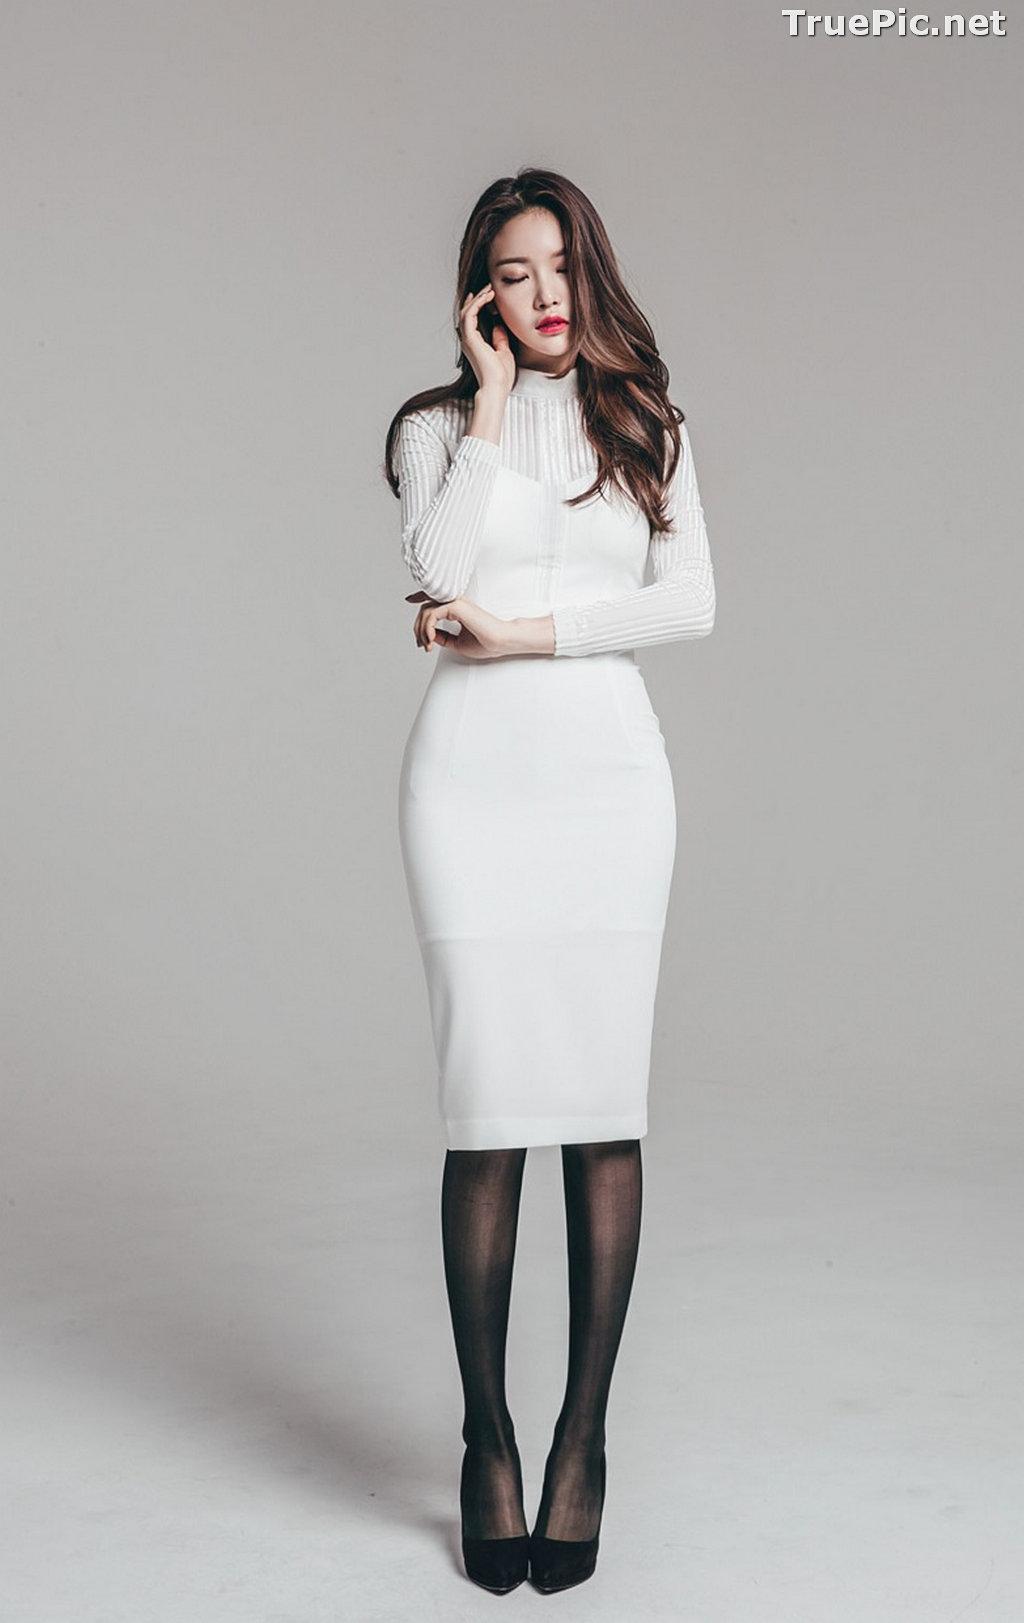 Image Korean Beautiful Model – Park Jung Yoon – Fashion Photography #11 - TruePic.net - Picture-54